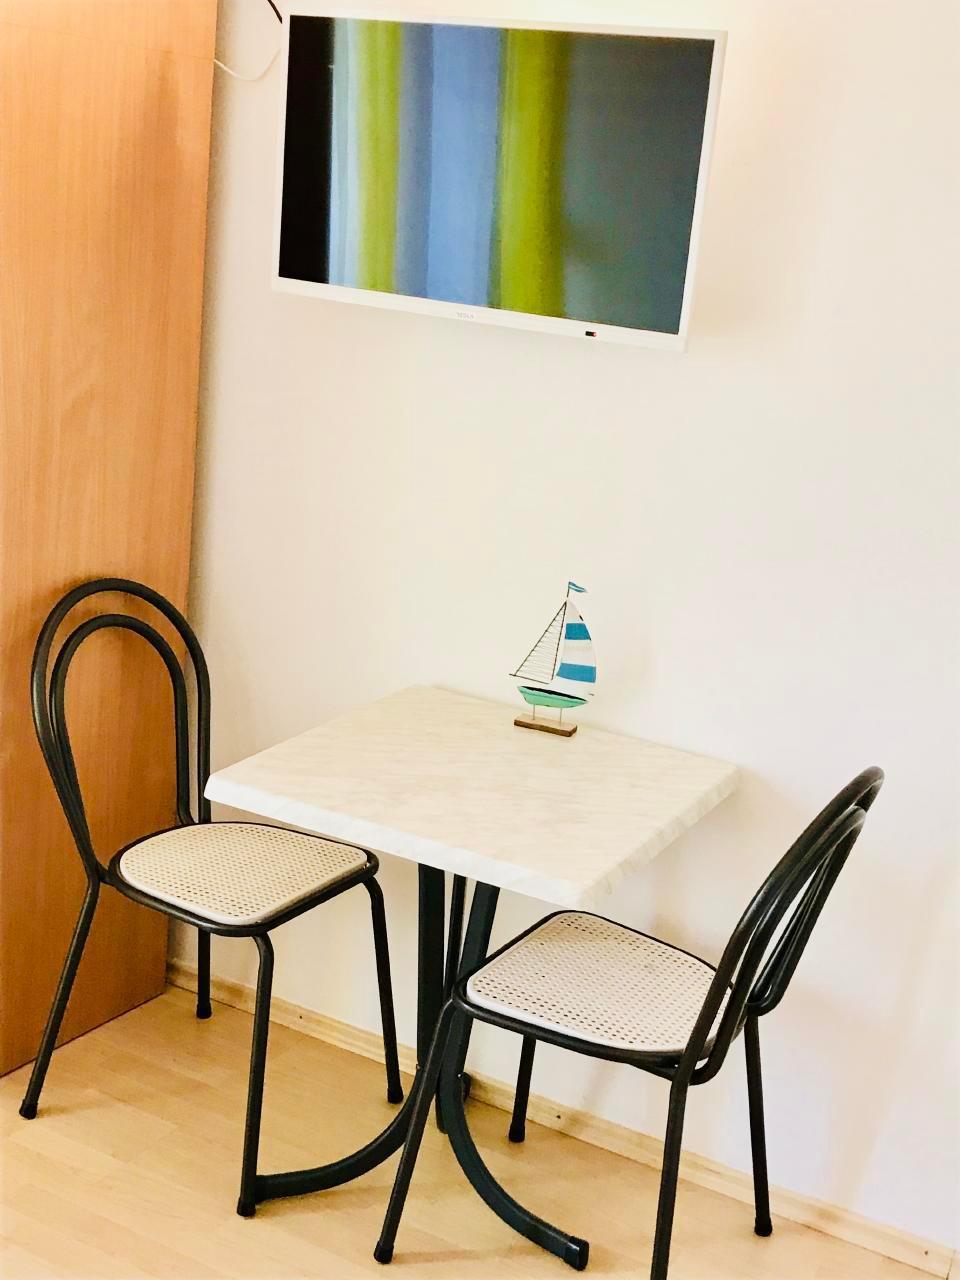 Ferienwohnung Apartmenthaus Ruza 6 - Apartment (98382), Kaštel Štafilić, , Dalmatien, Kroatien, Bild 5